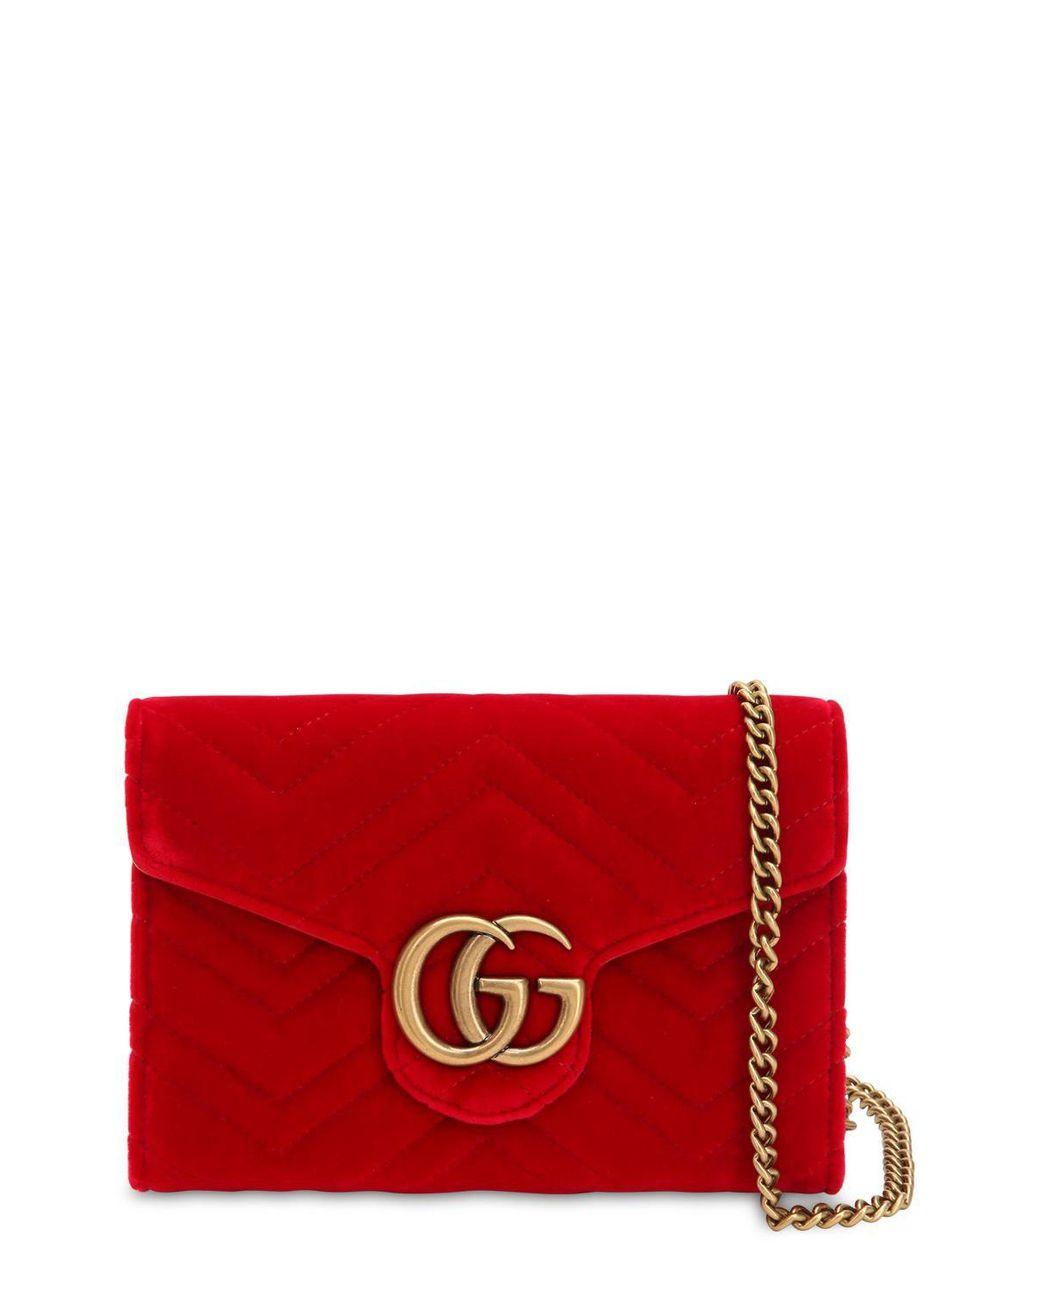 dad69cb2b42 Gucci Gg Marmont Velvet Shoulder Bag in Red - Lyst